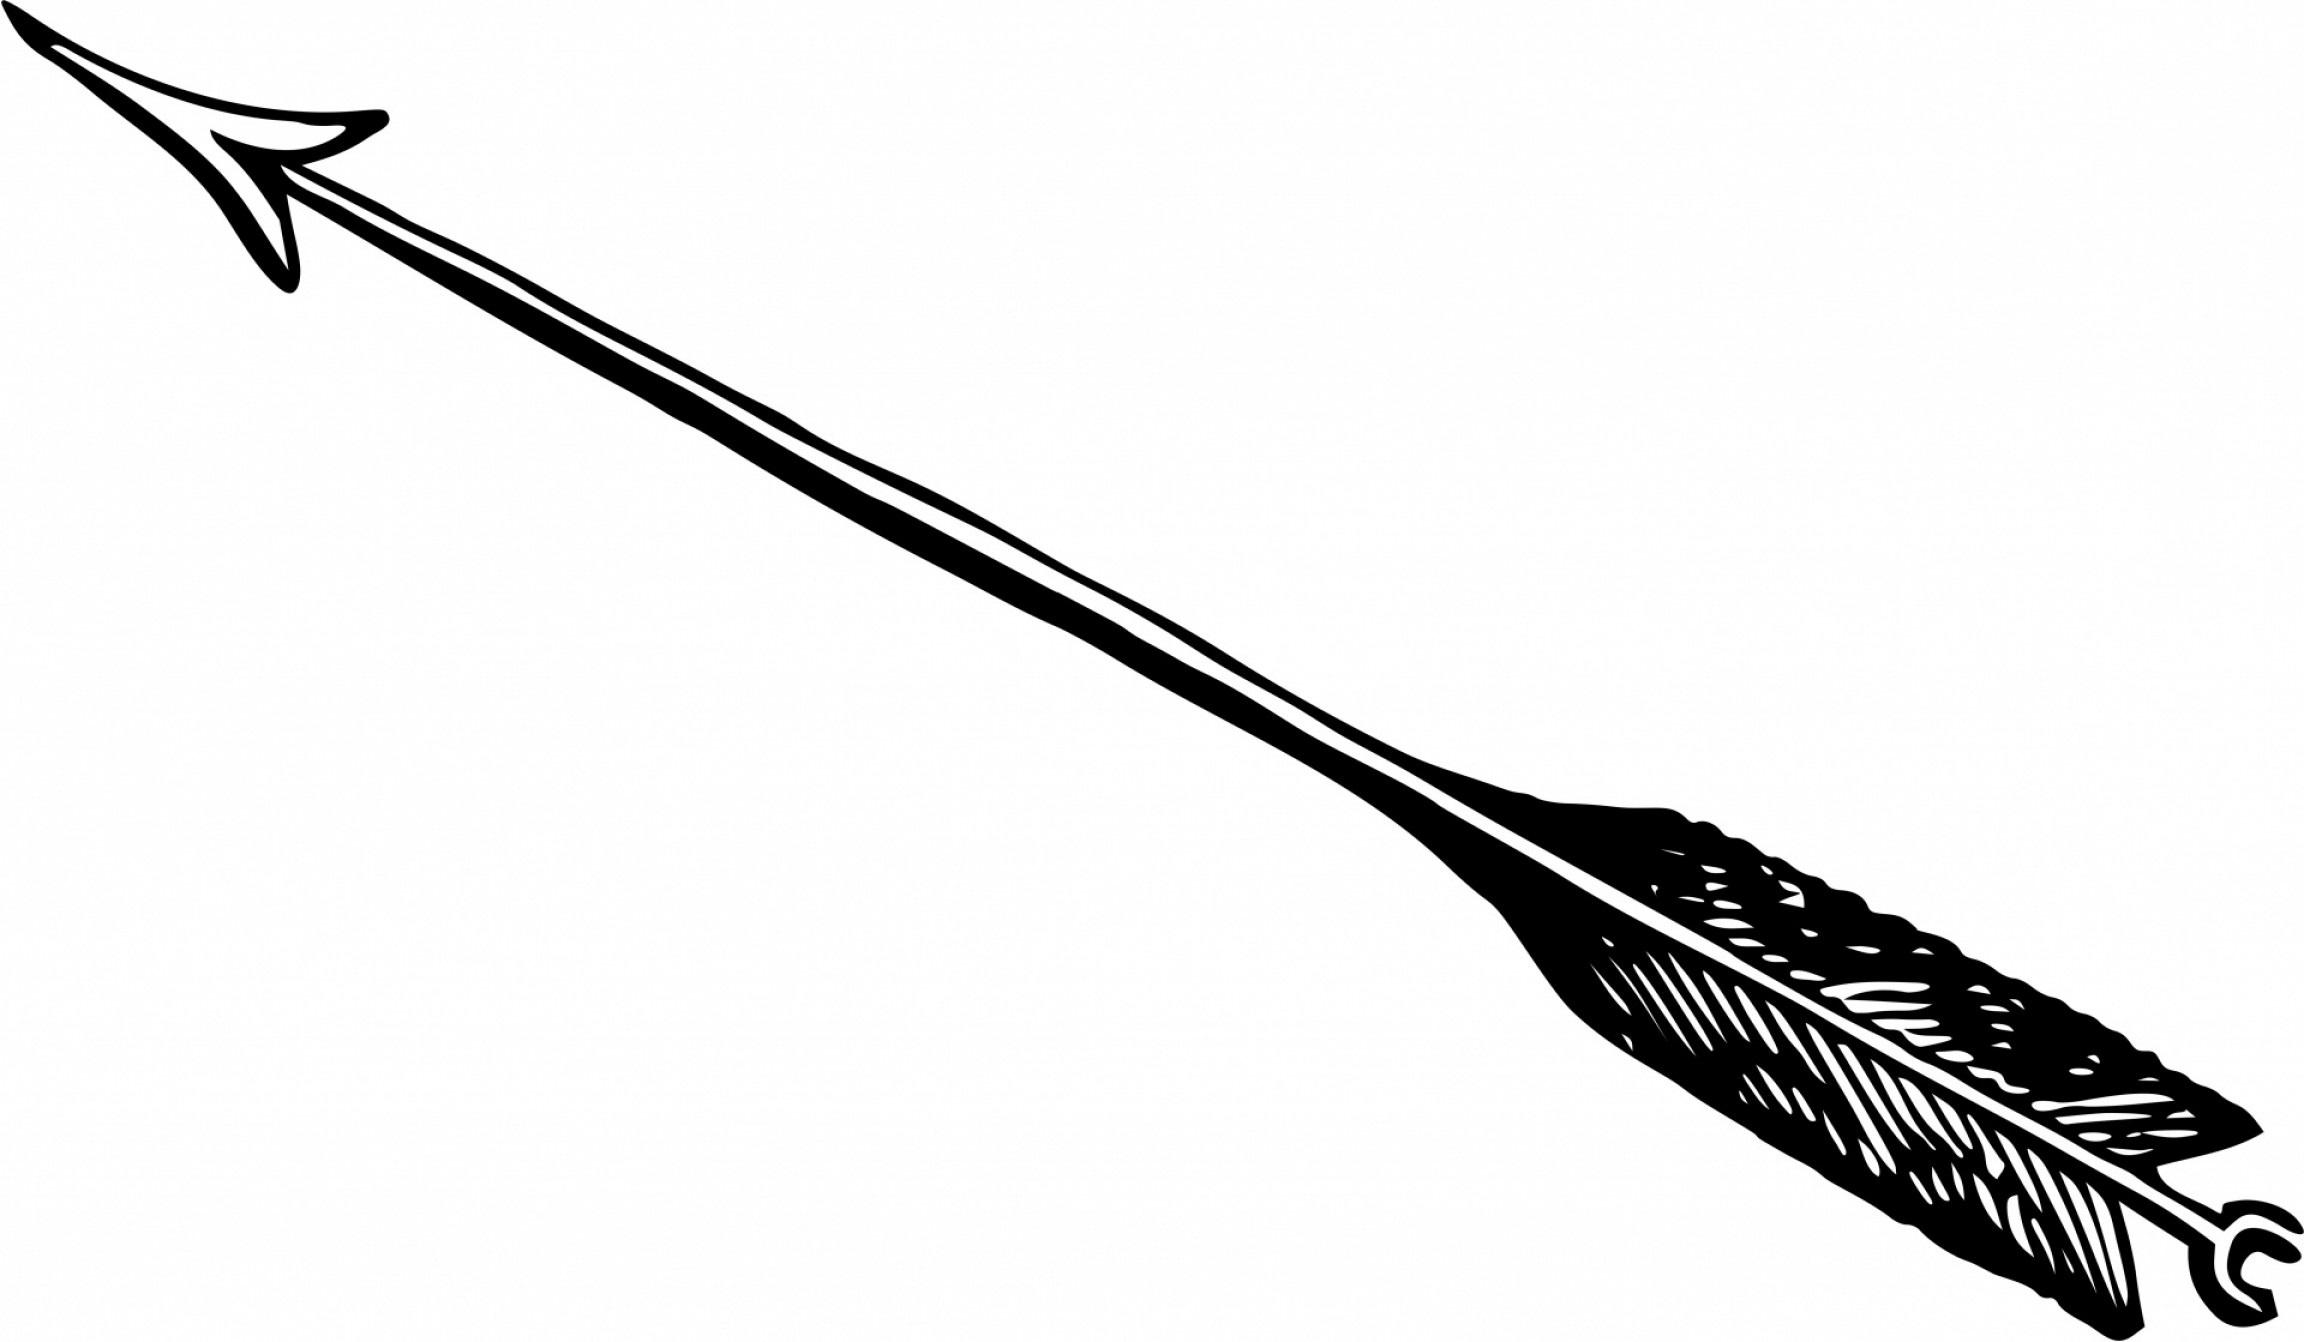 Arrow clipart black and white Elegant Arrow Clipart Black And White.